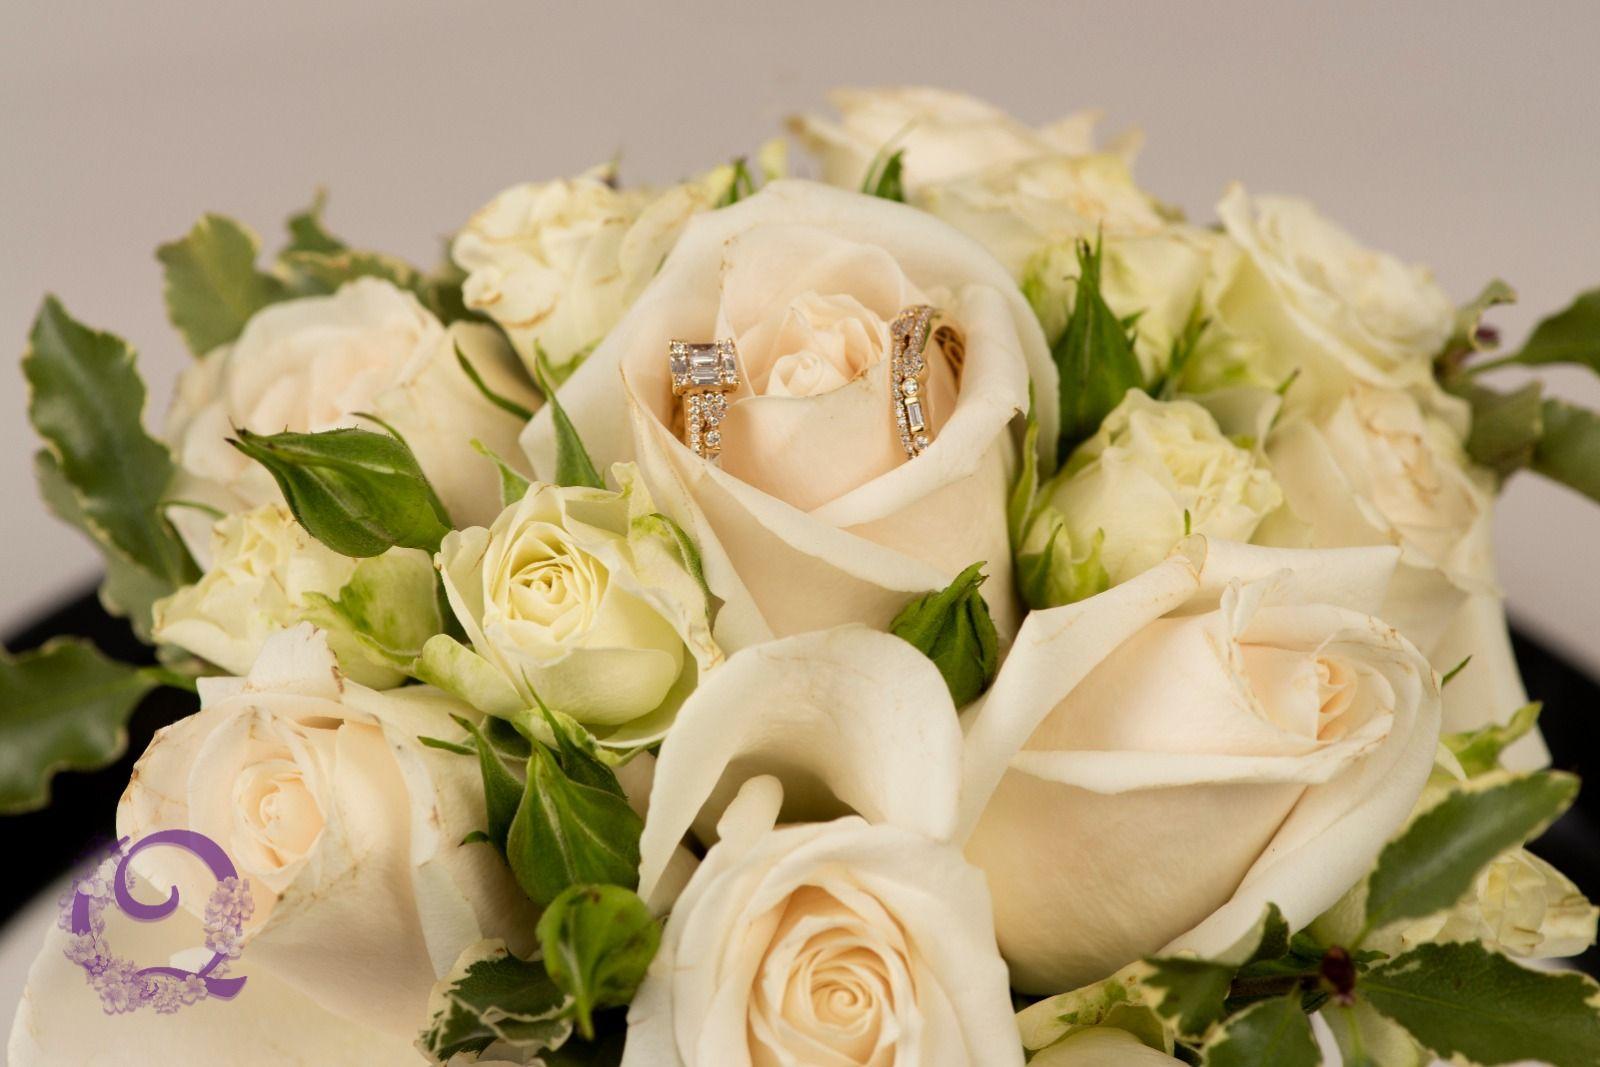 Floral Arrangements Wedding Weddingphoto Photography Photoshoot Flowers Rings Engagement Qwedphoto عرس عروس زفاف ز White Roses Flowers Bouquet Rose